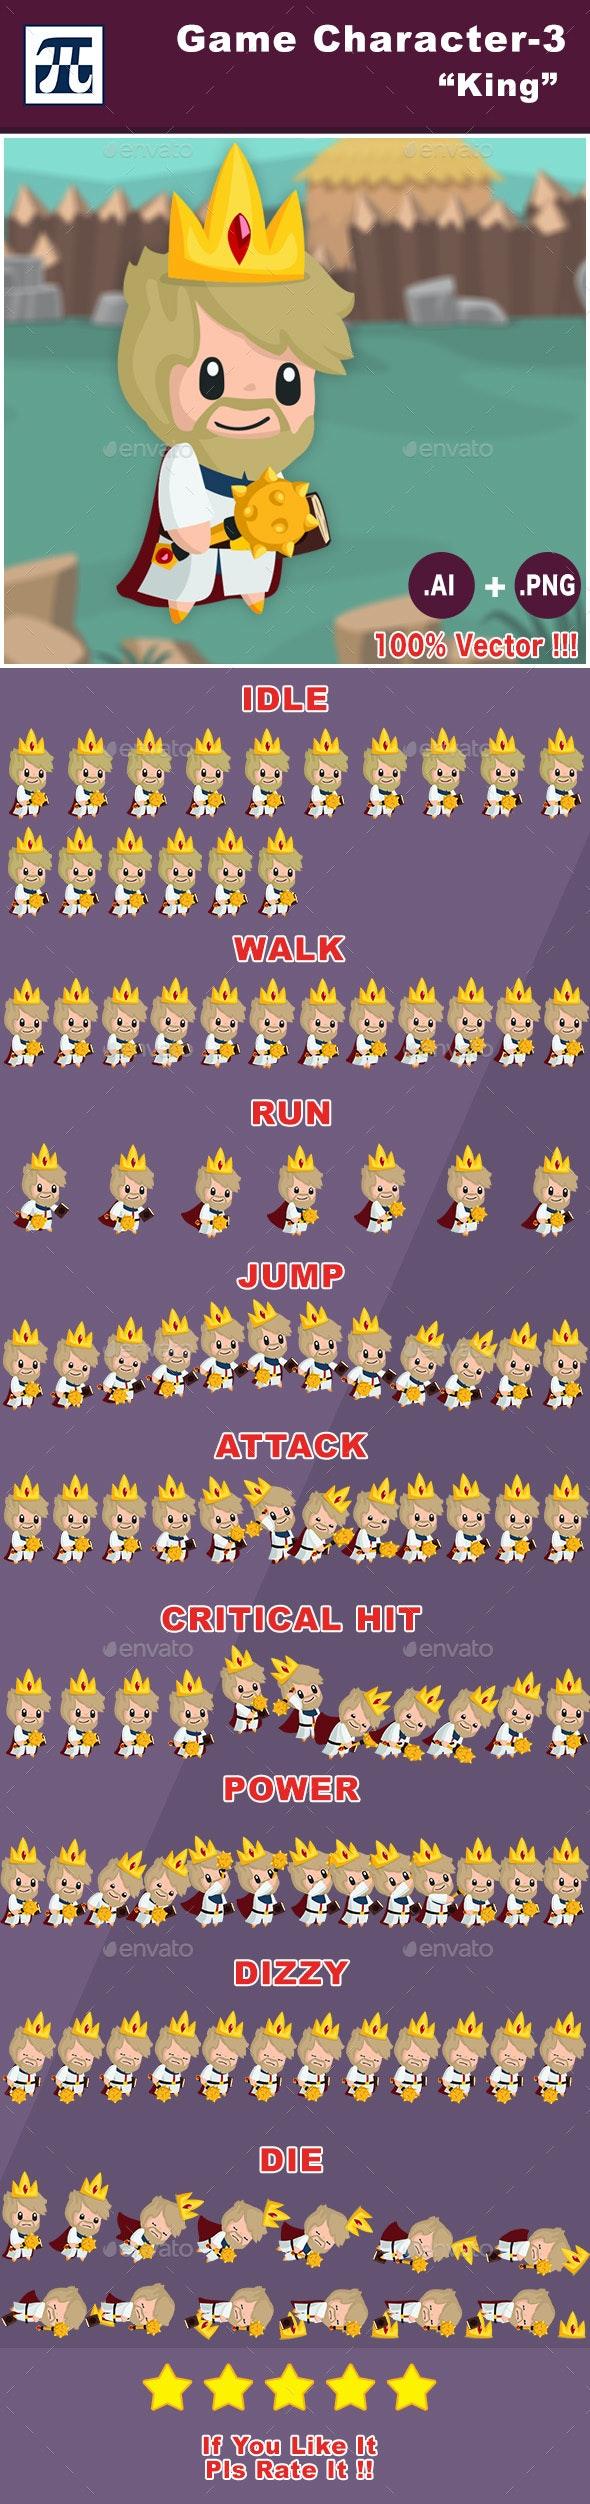 Game Character Set 3 - King - Sprites Game Assets